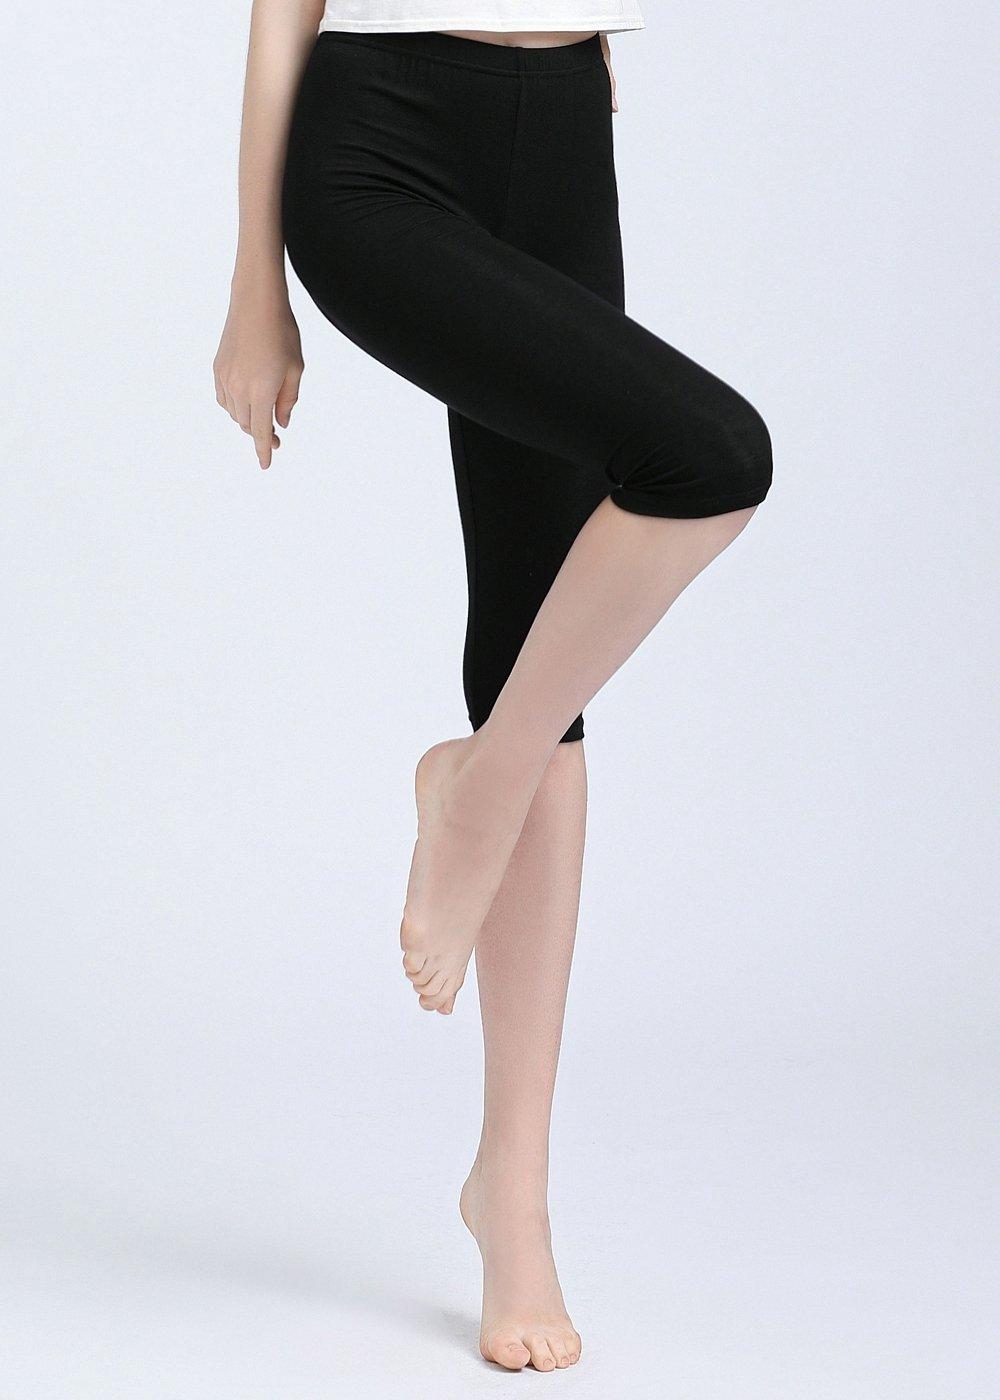 Vinconie Women Activewear Capris Stretchy Exercises Sexy Workout Leggings Soft by Vinconie (Image #4)